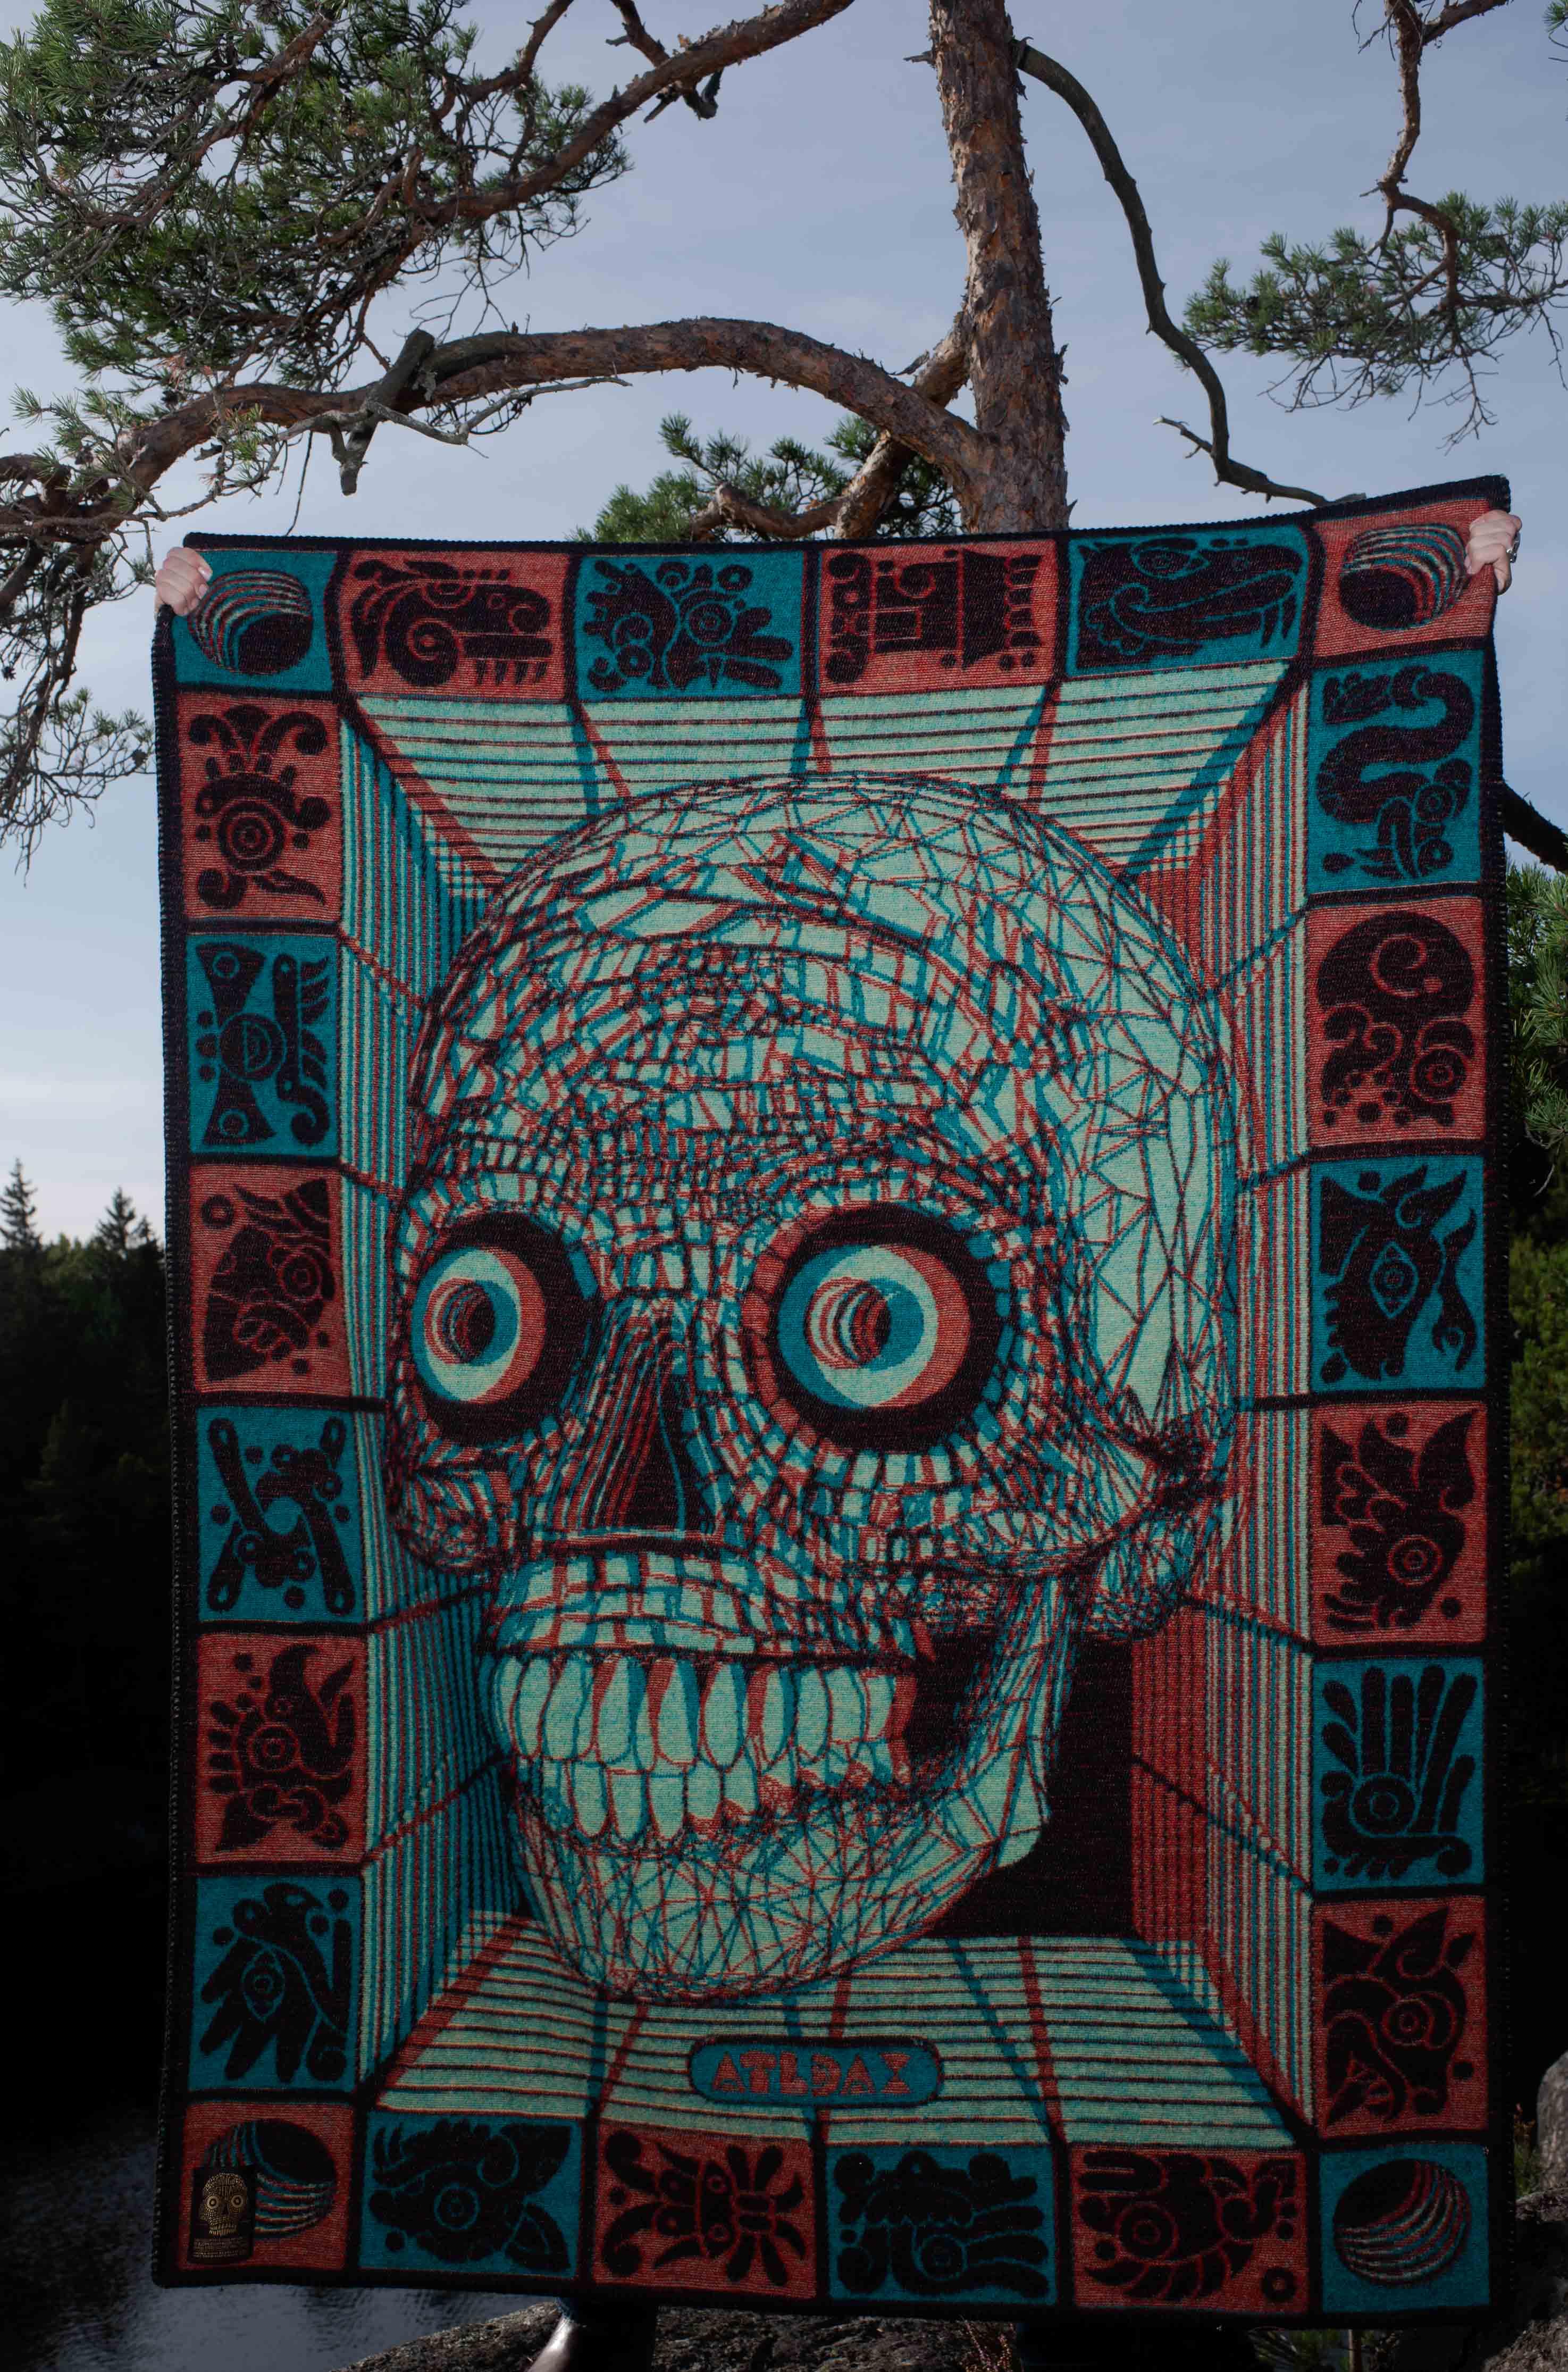 Indigofera  Stereoscopic 3D Blanket